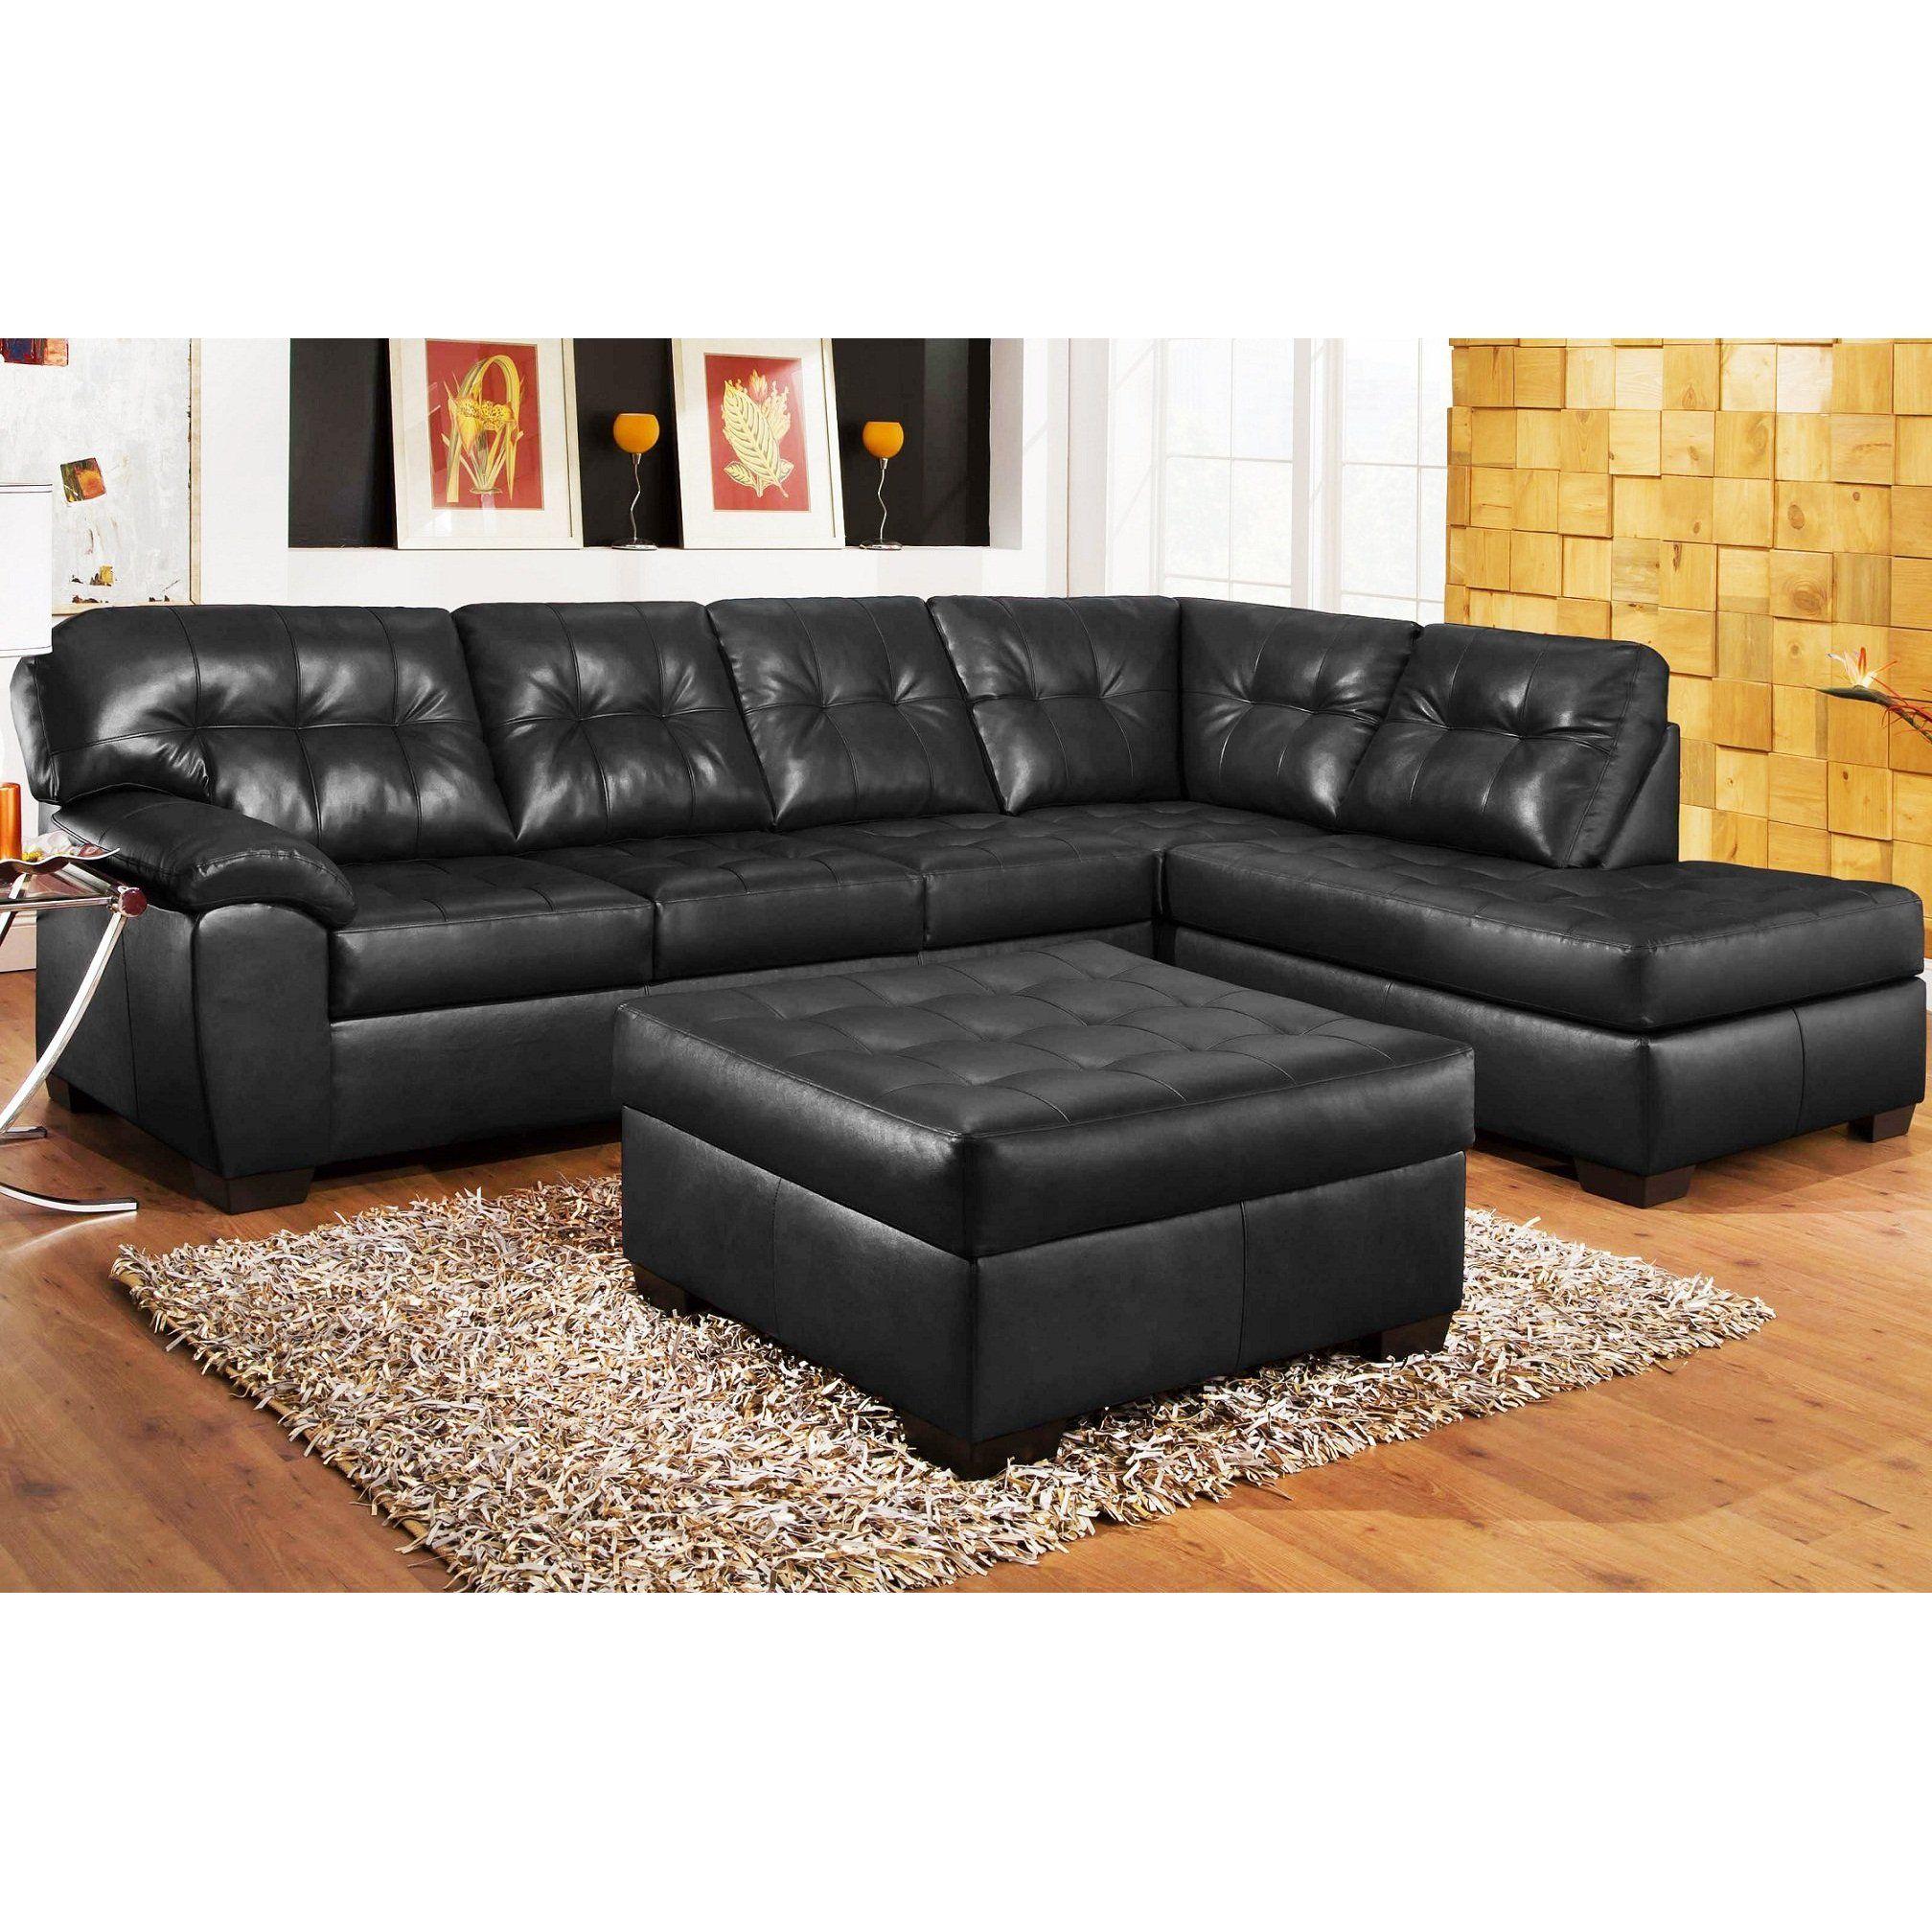 3pc Black Leather Sectional Sofa Chaise Ottoman Set Create